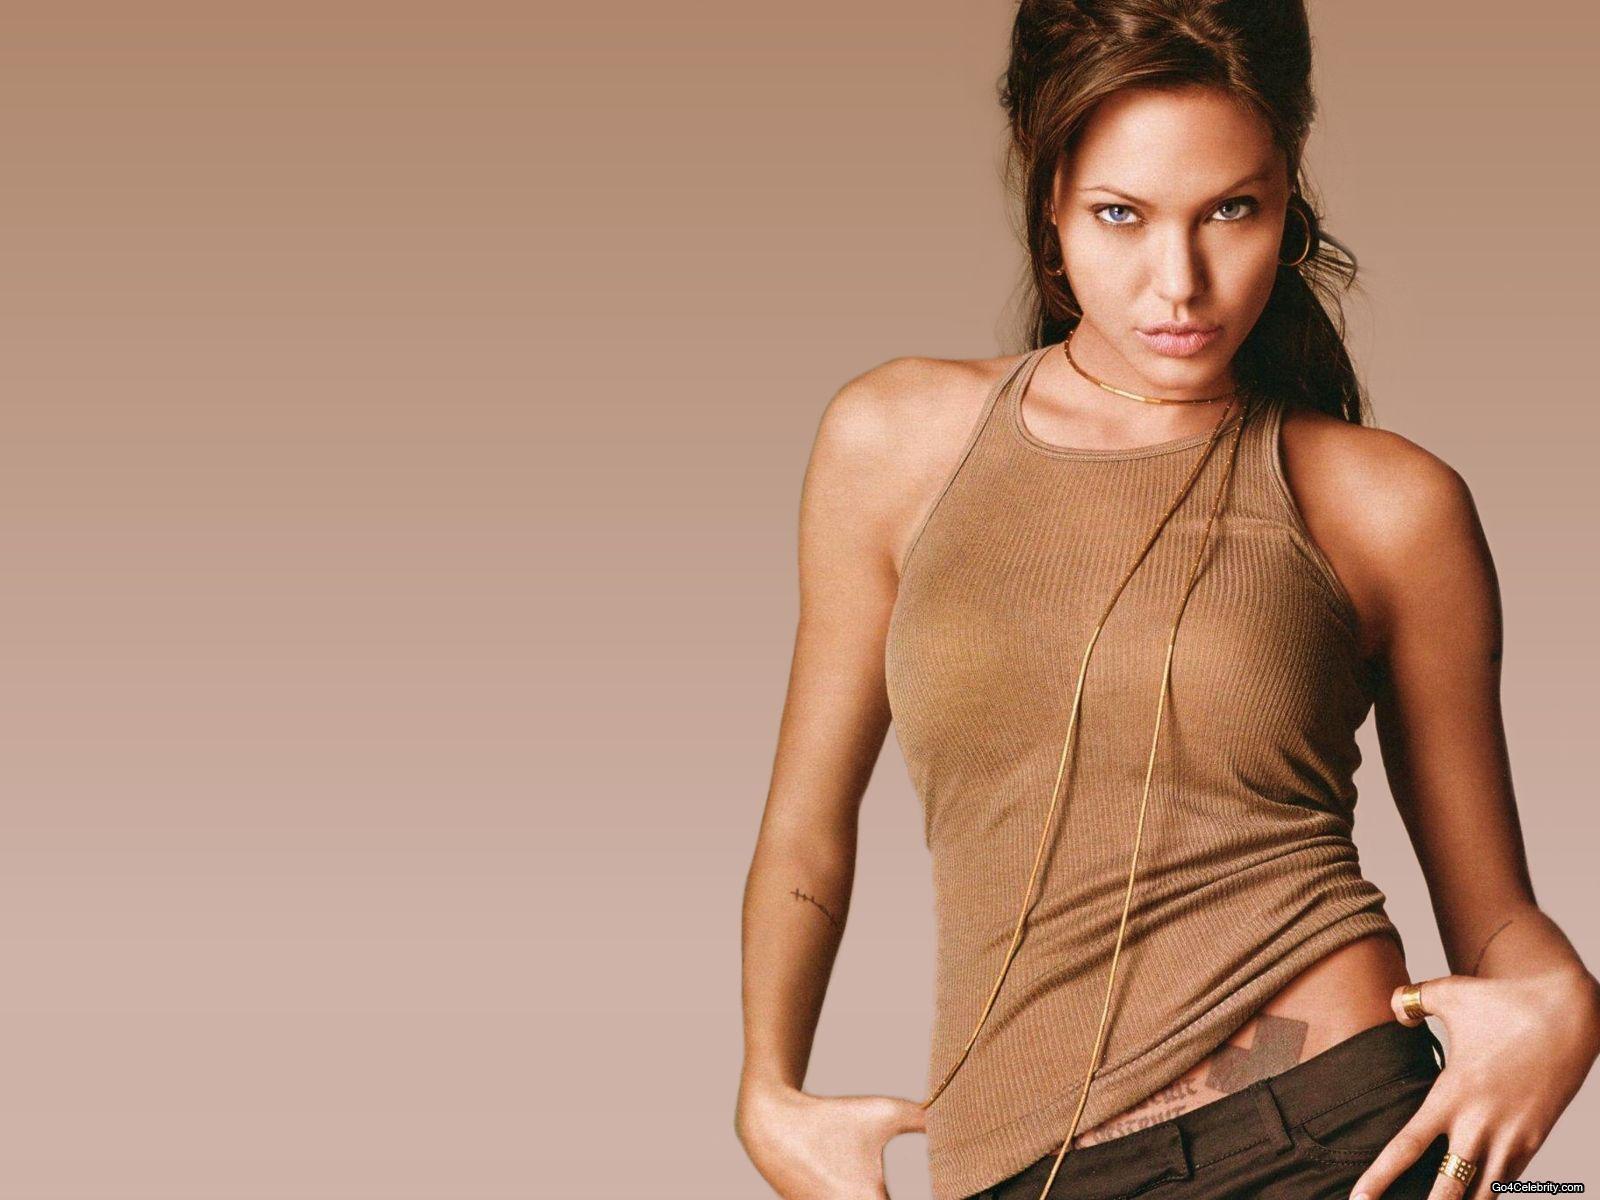 Angelina Jolie Sexi Movie sexy images - angelina jolie wallpaper (2701363) - fanpop